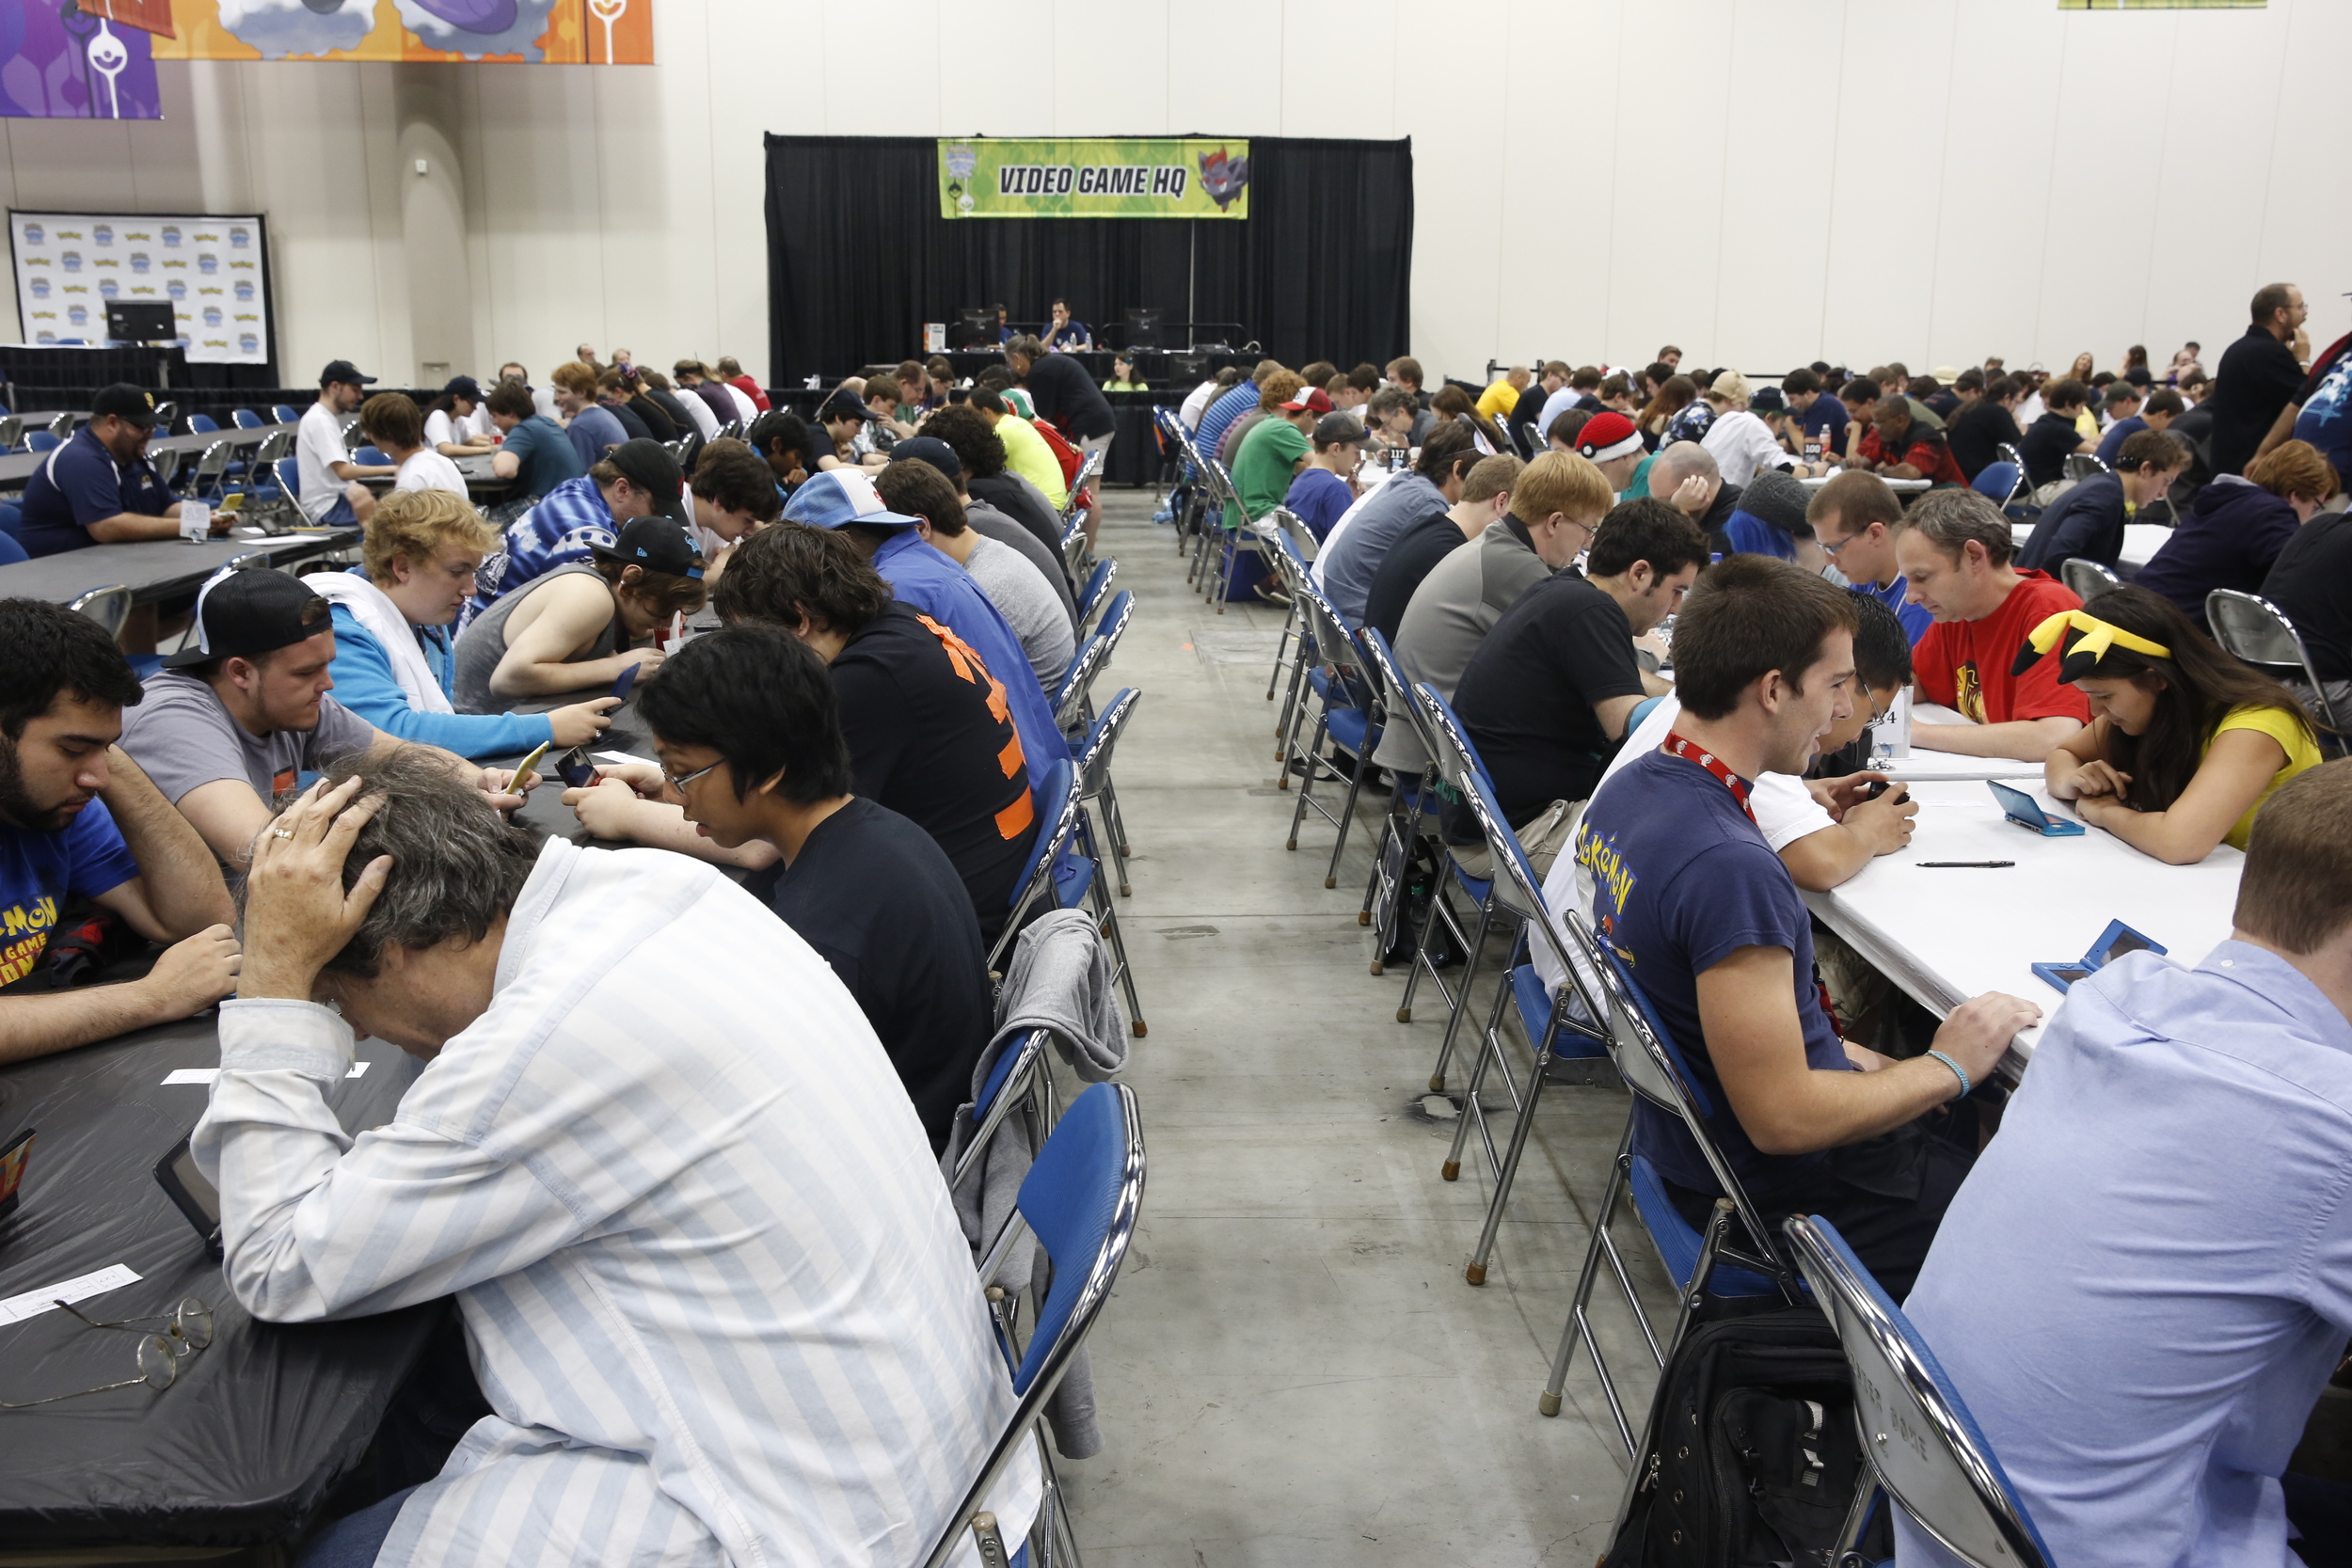 2013 U.S. Pokémon National Championships Image 8.JPG